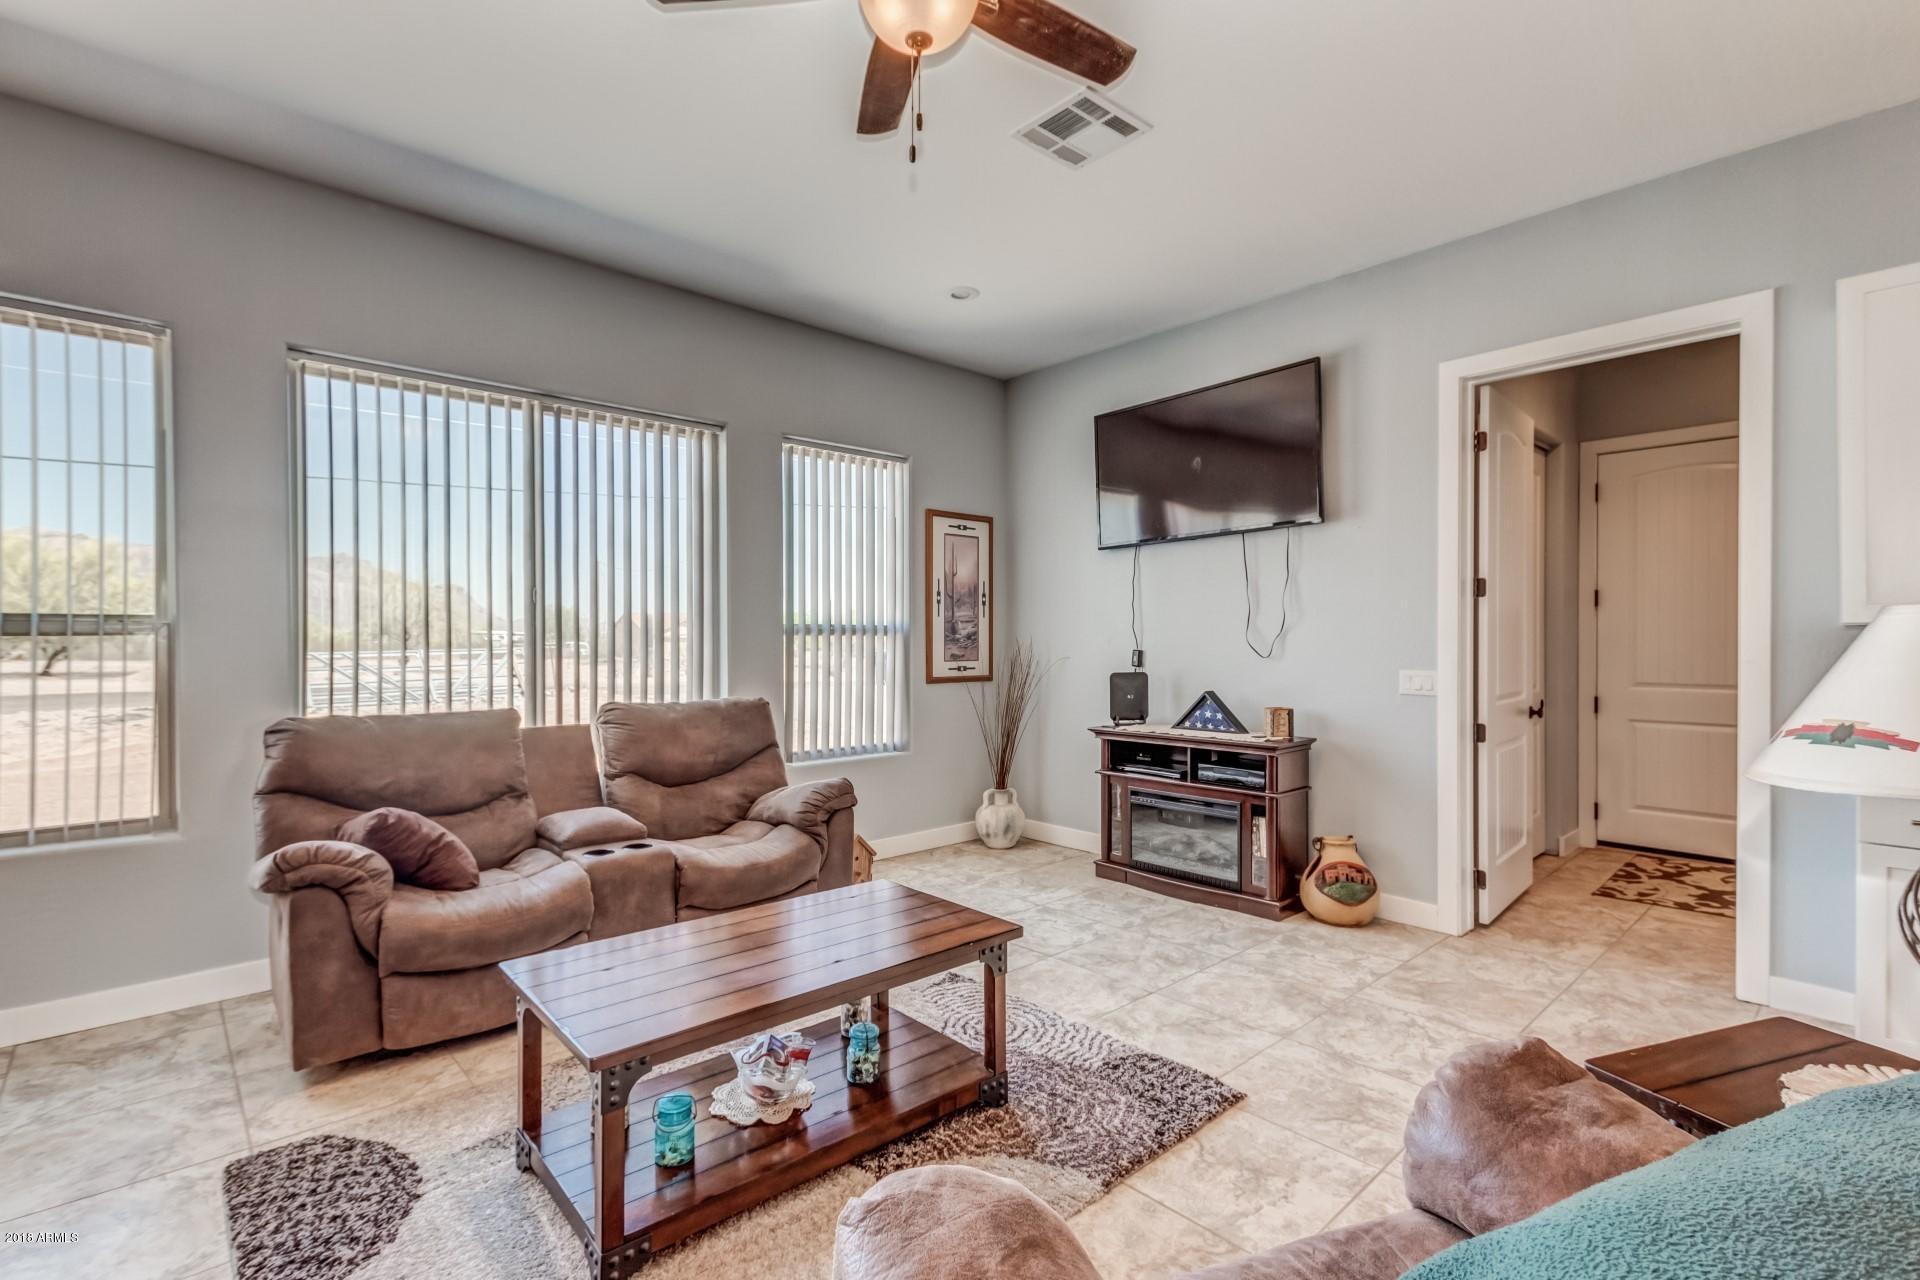 MLS 5754065 1120 N Vista Road, Apache Junction, AZ 85119 Apache Junction AZ Newly Built